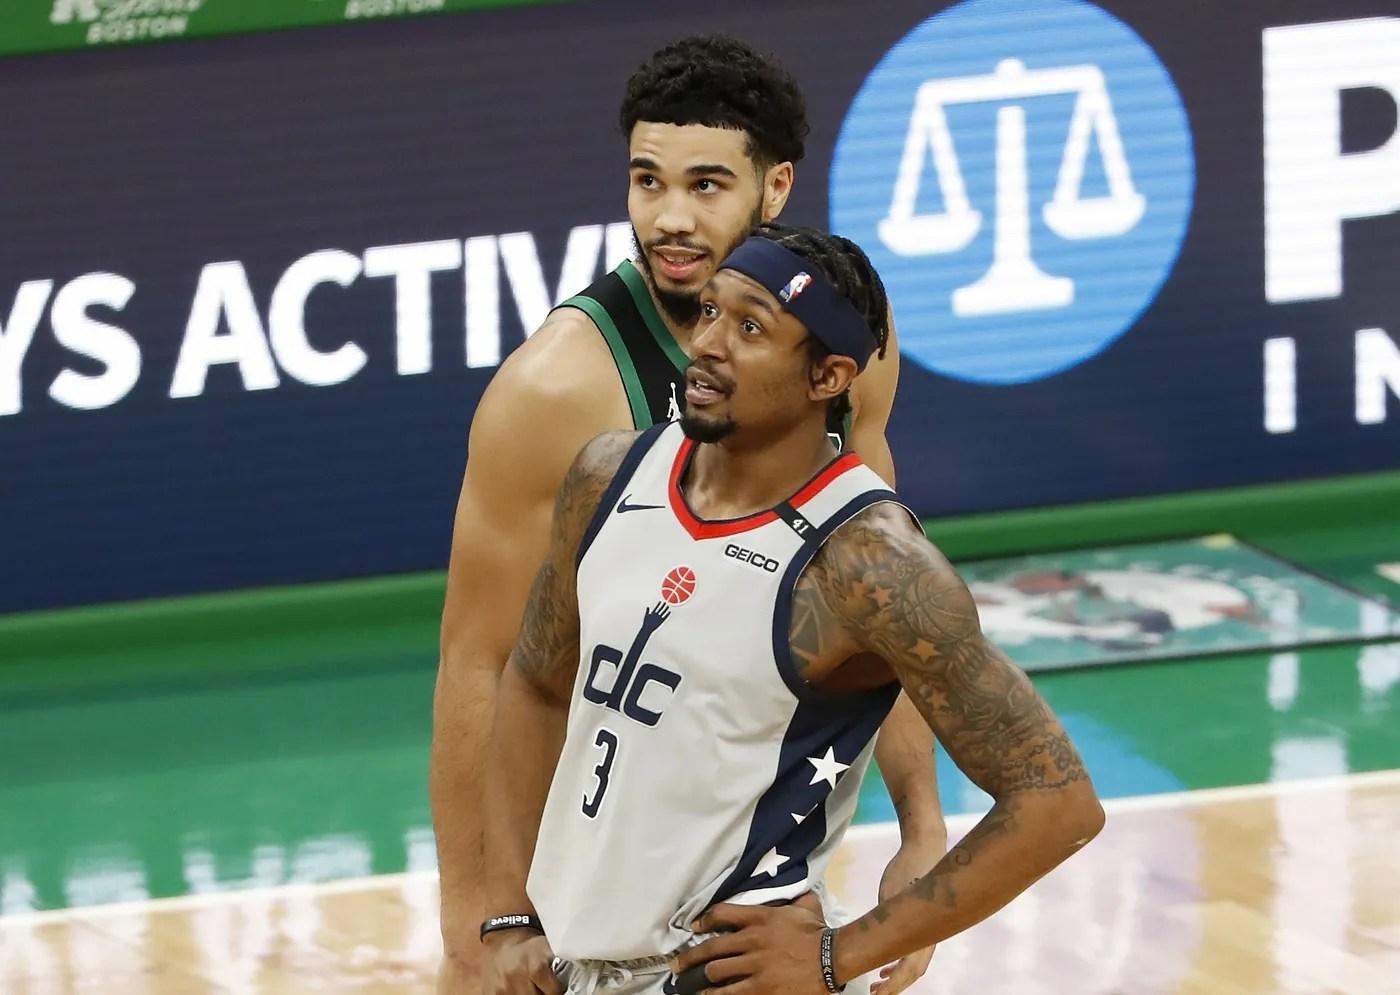 Feb 28, 2021; Boston, Massachusetts, USA; Boston Celtics forward Jayson Tatum (0) talks with Washington Wizards guard Bradley Beal (3) during the second quarter at TD Garden.